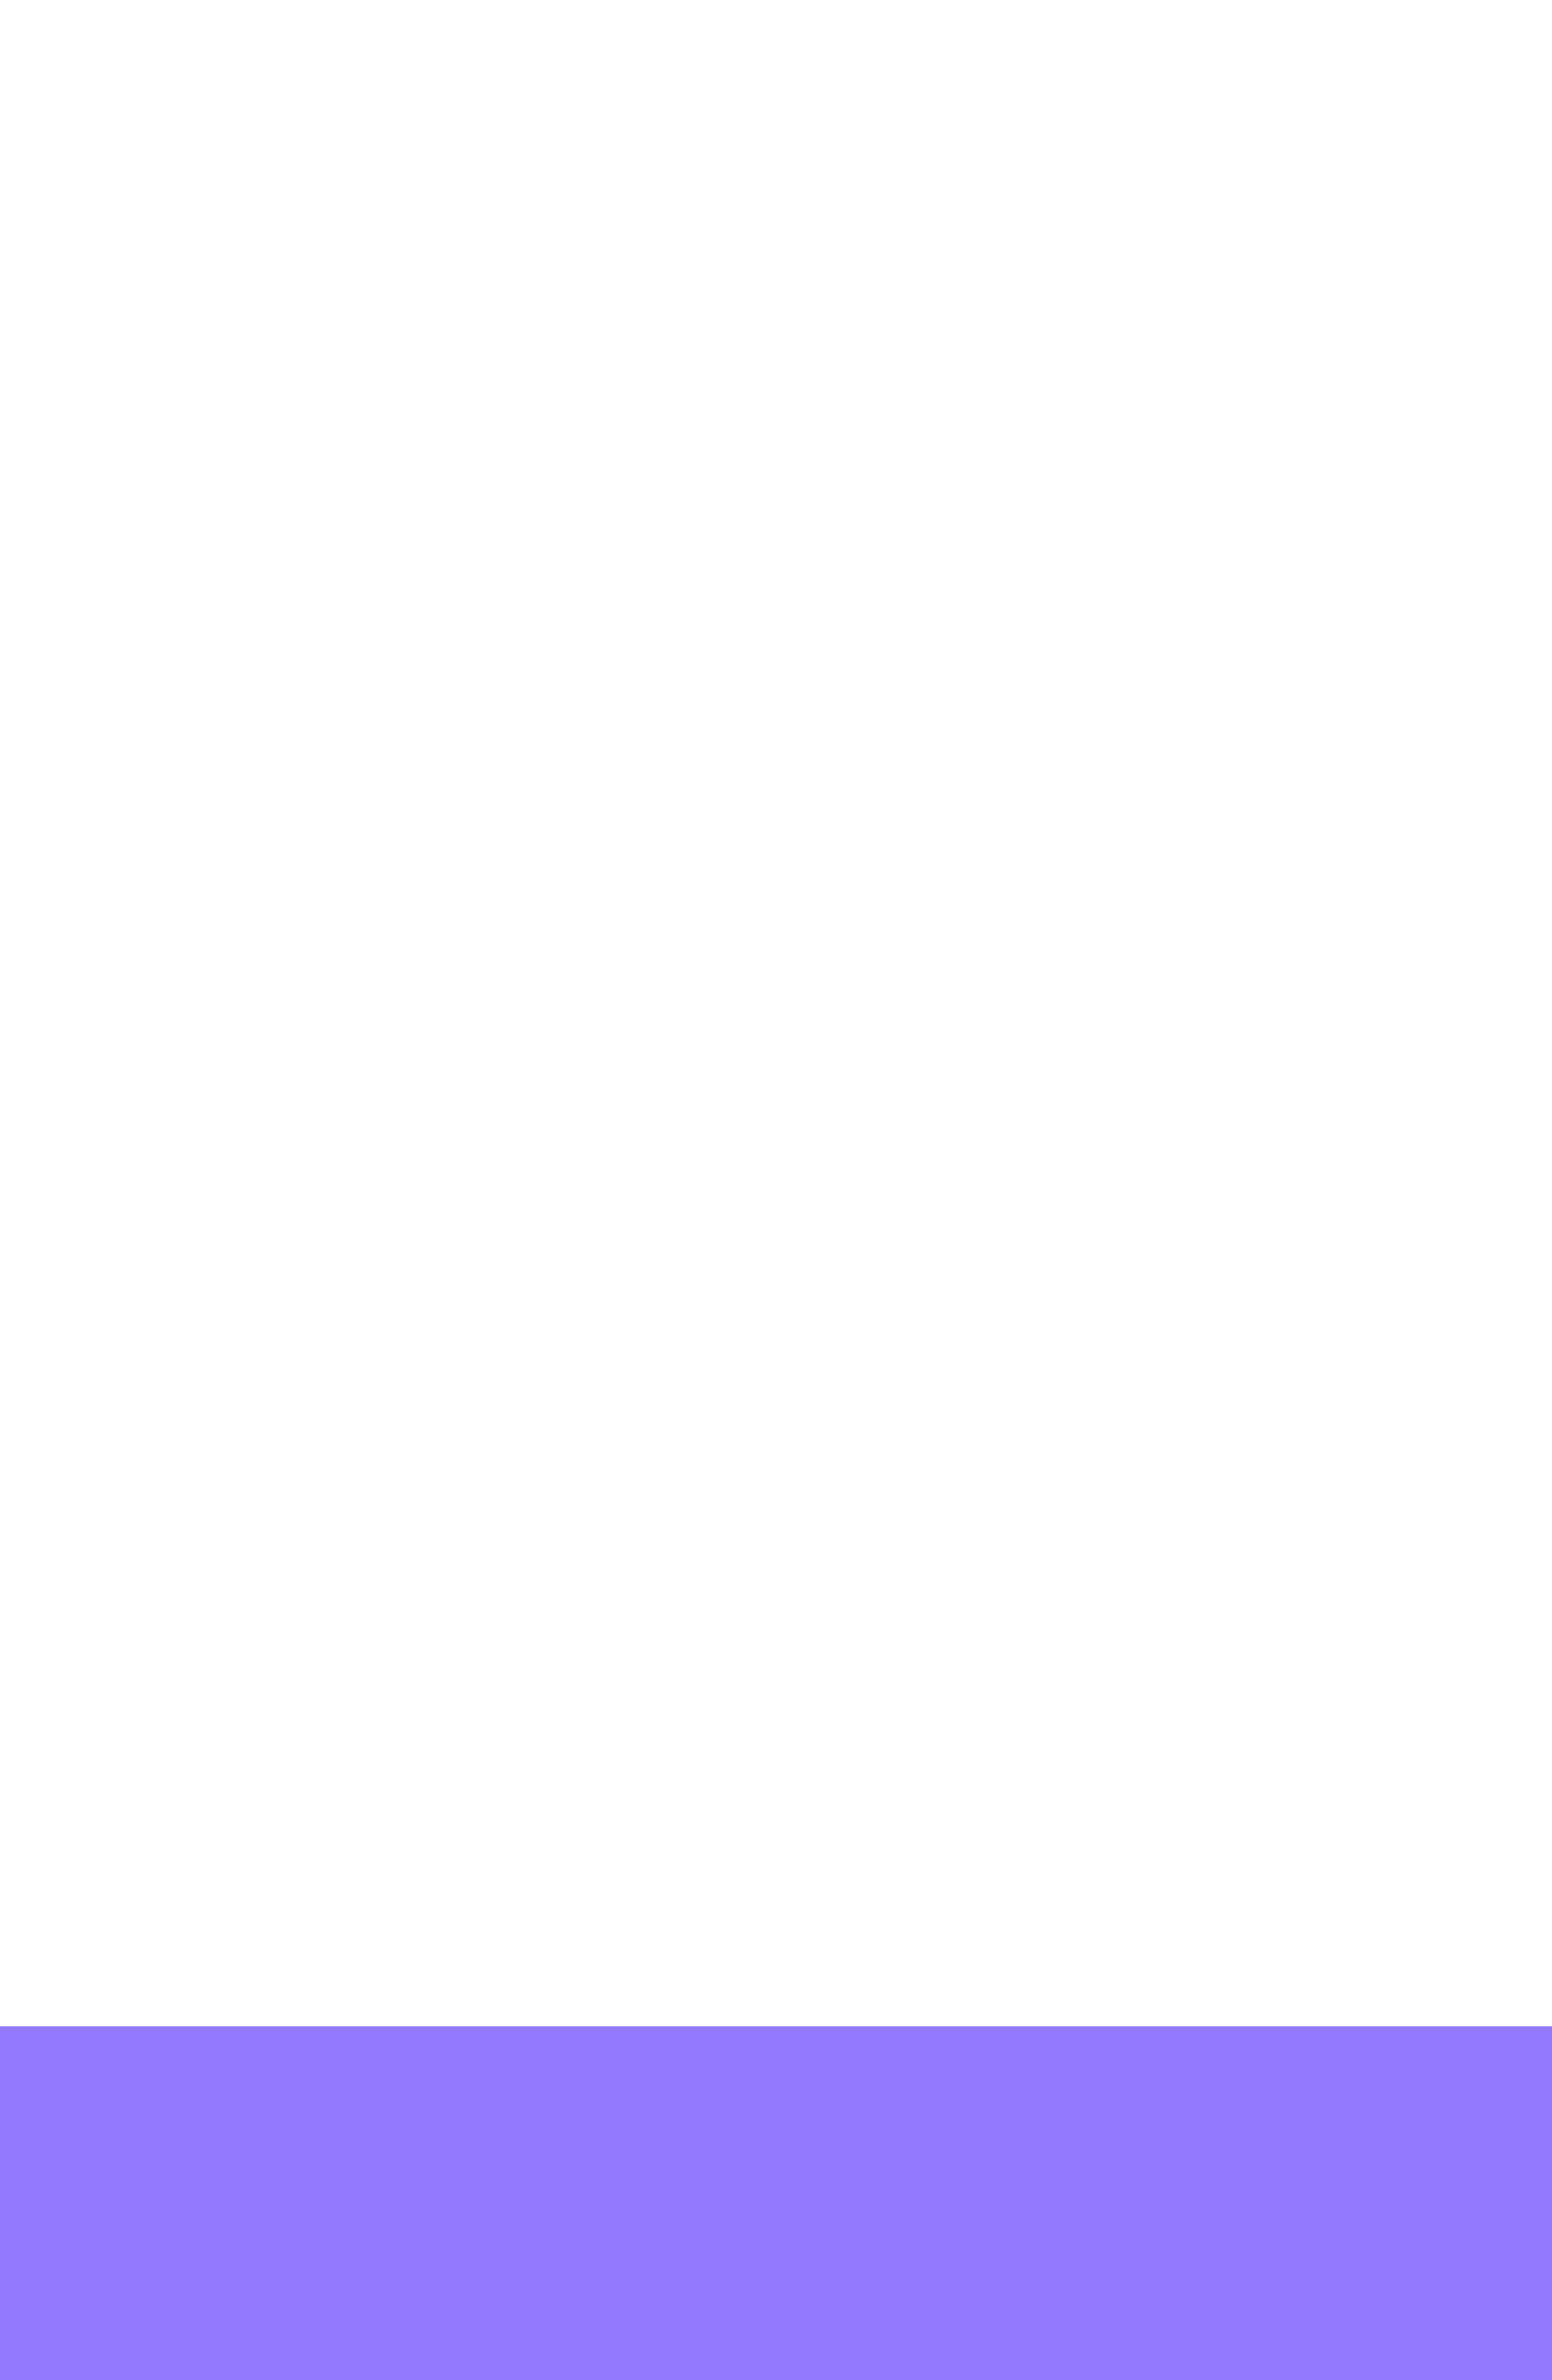 Revival Press